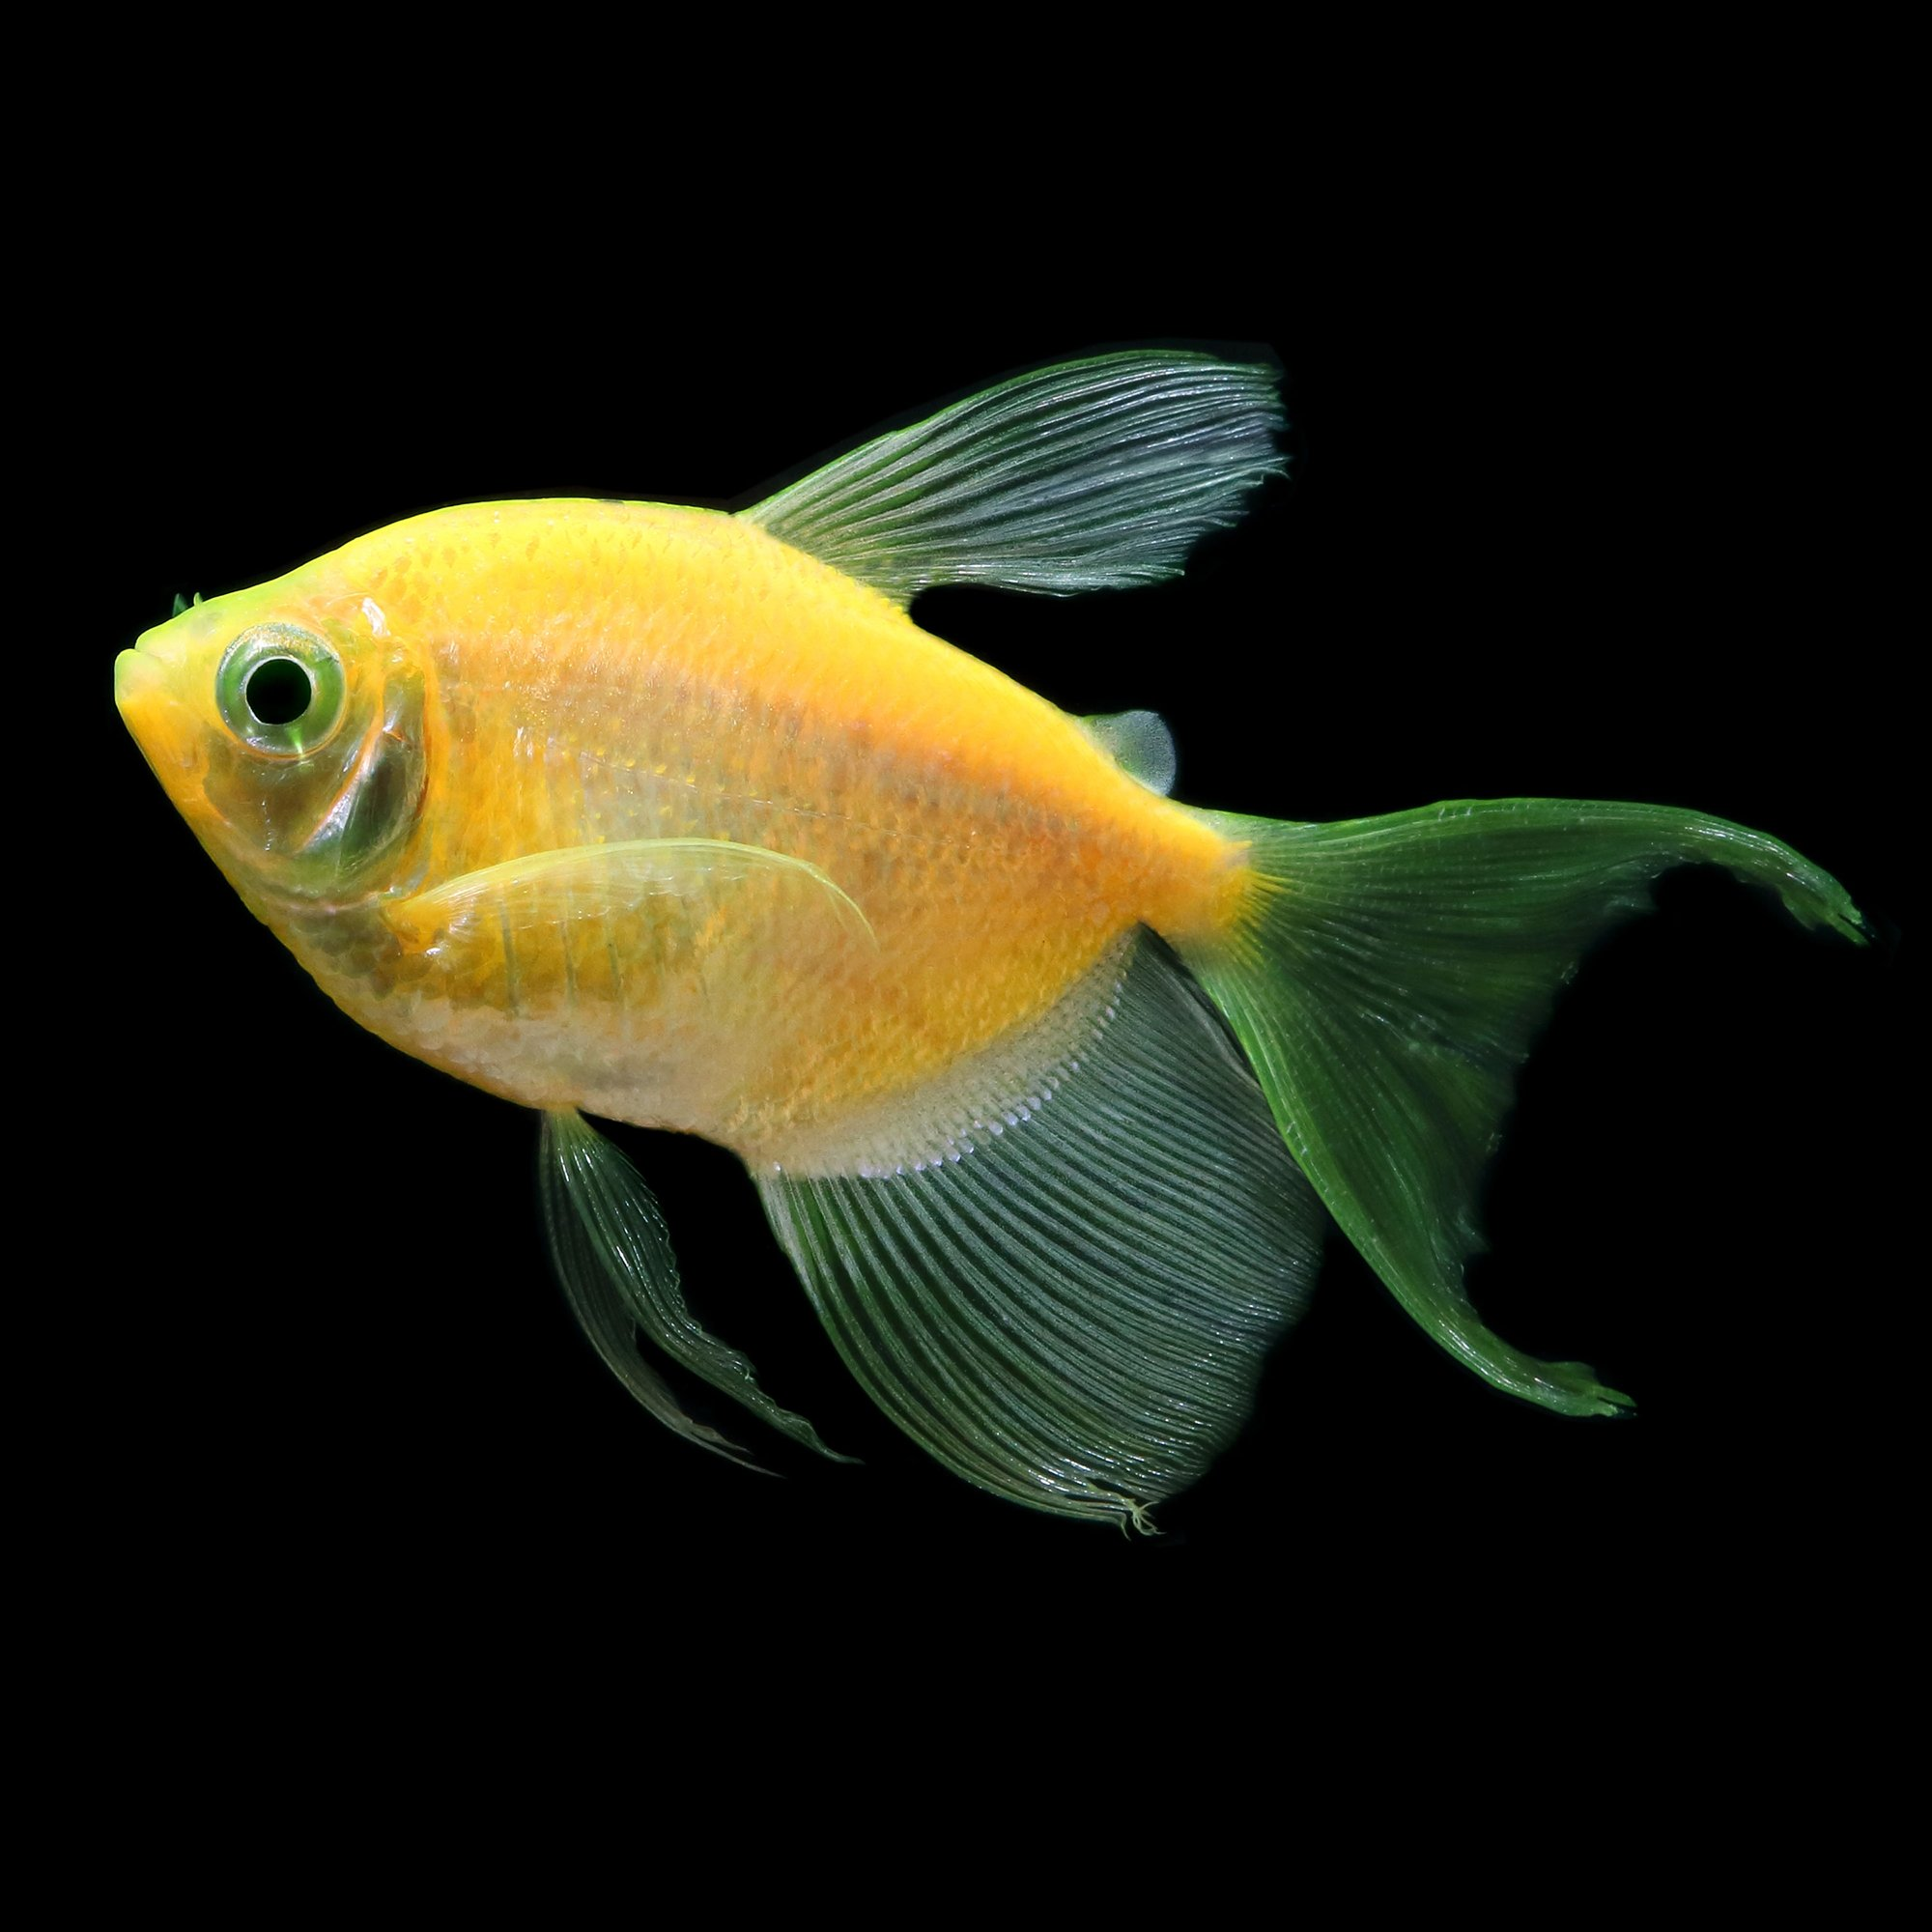 Glofish sunburst orange longfin tetra petco for Petco fish food